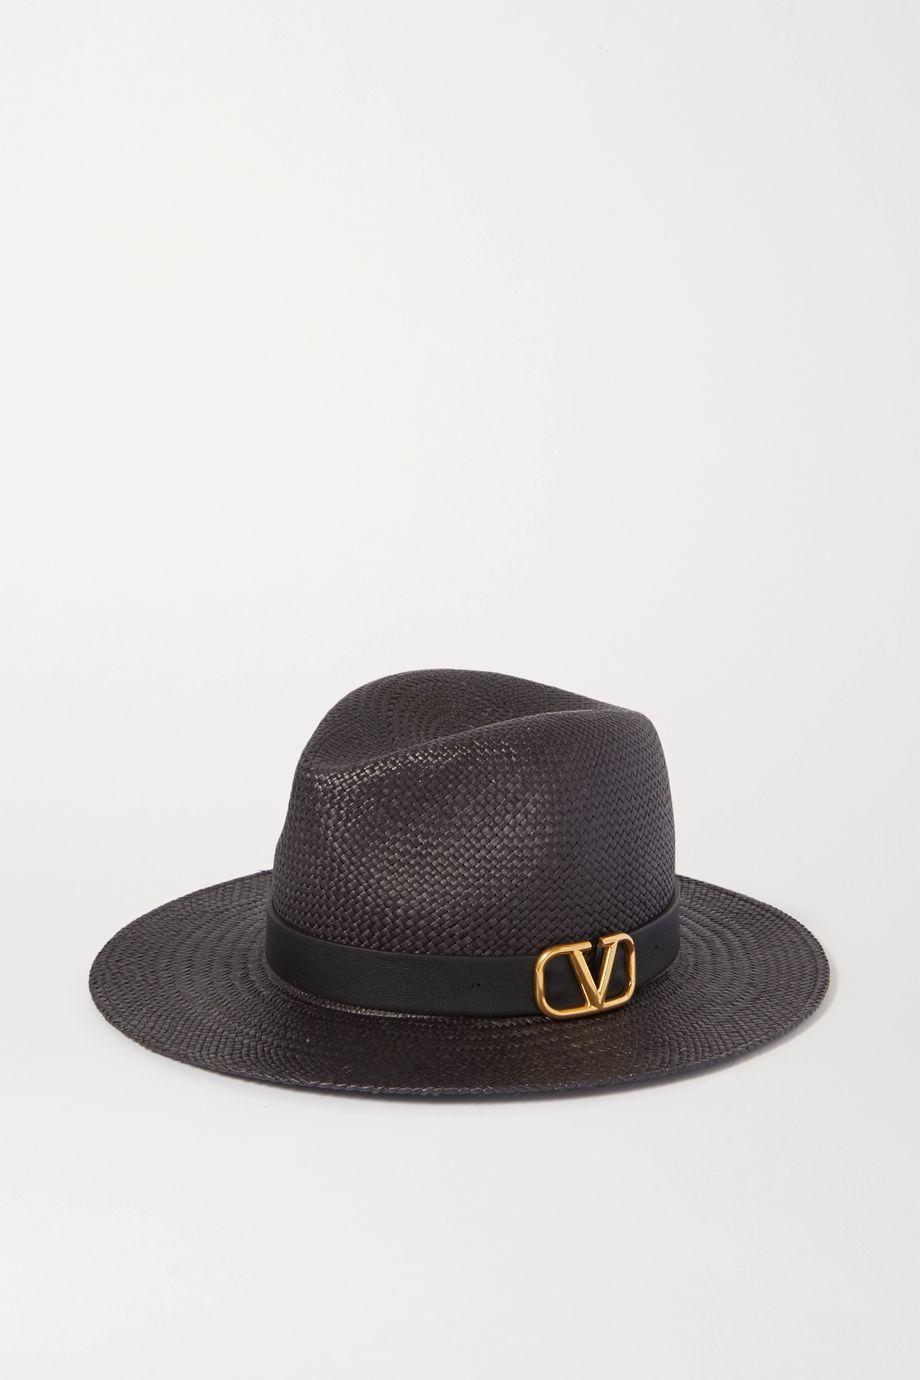 Valentino Valentino Garavani embellished leather-trimmed straw fedora